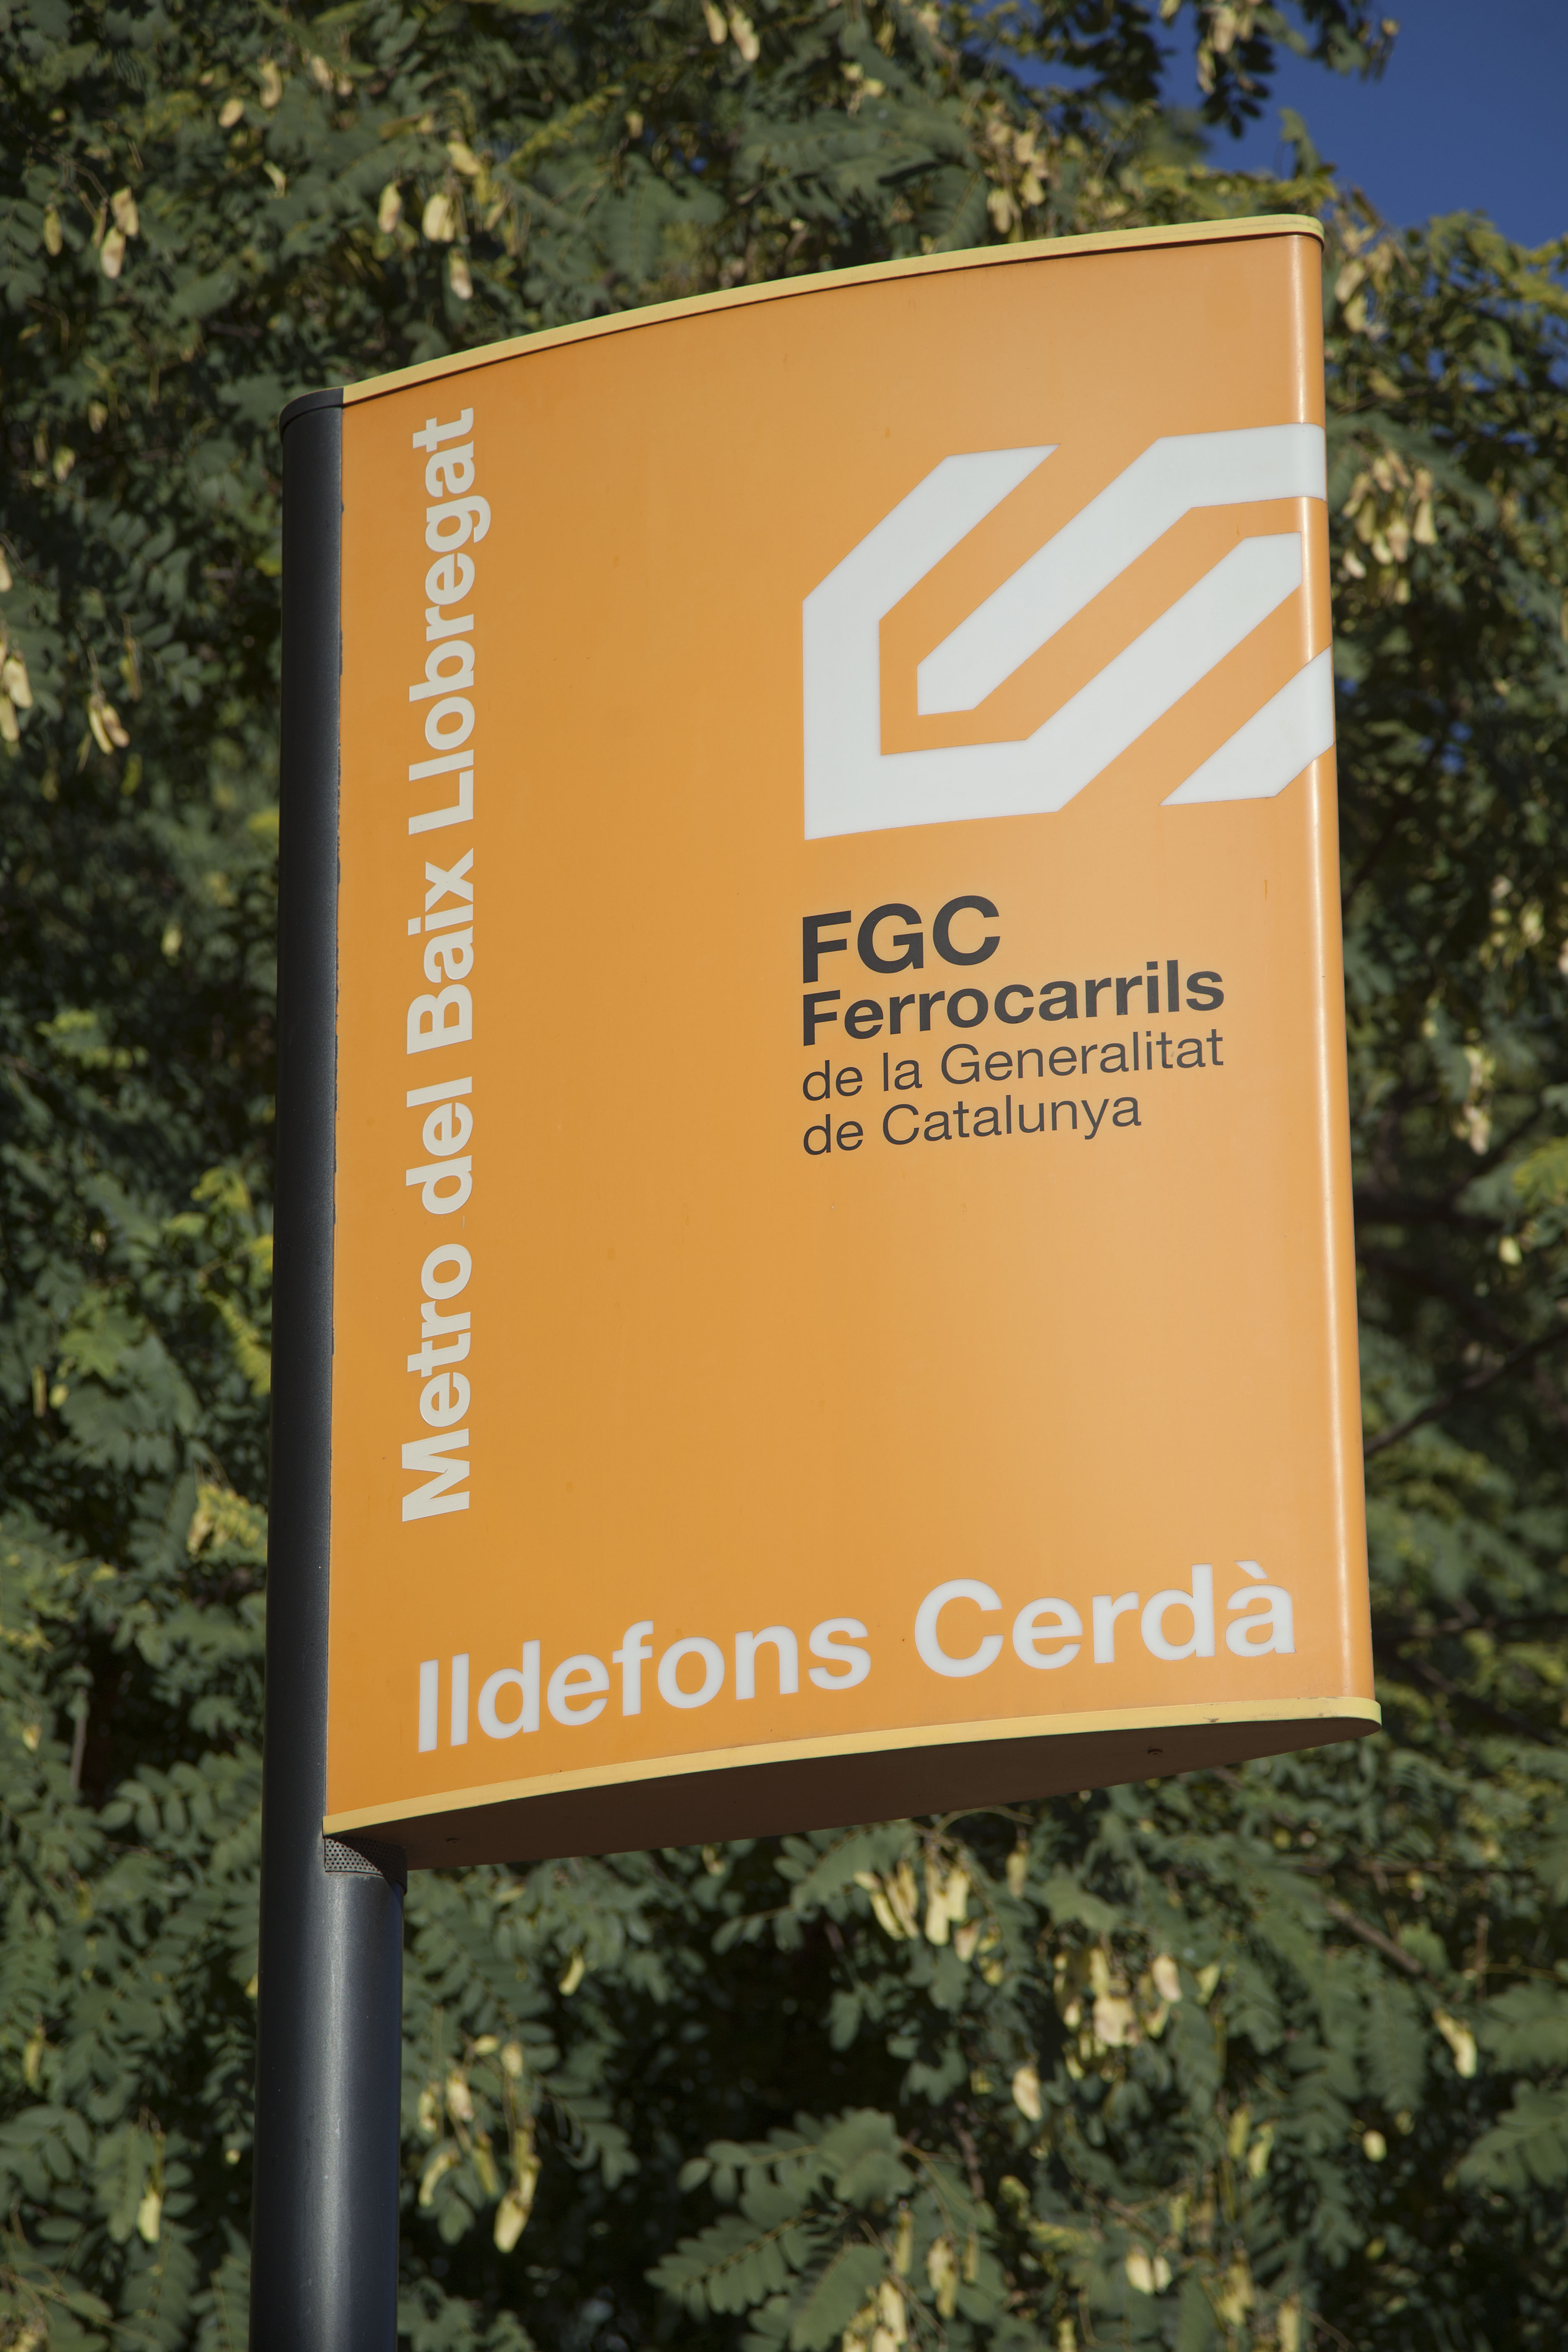 ILDEFONS -CERDÀ -FGC